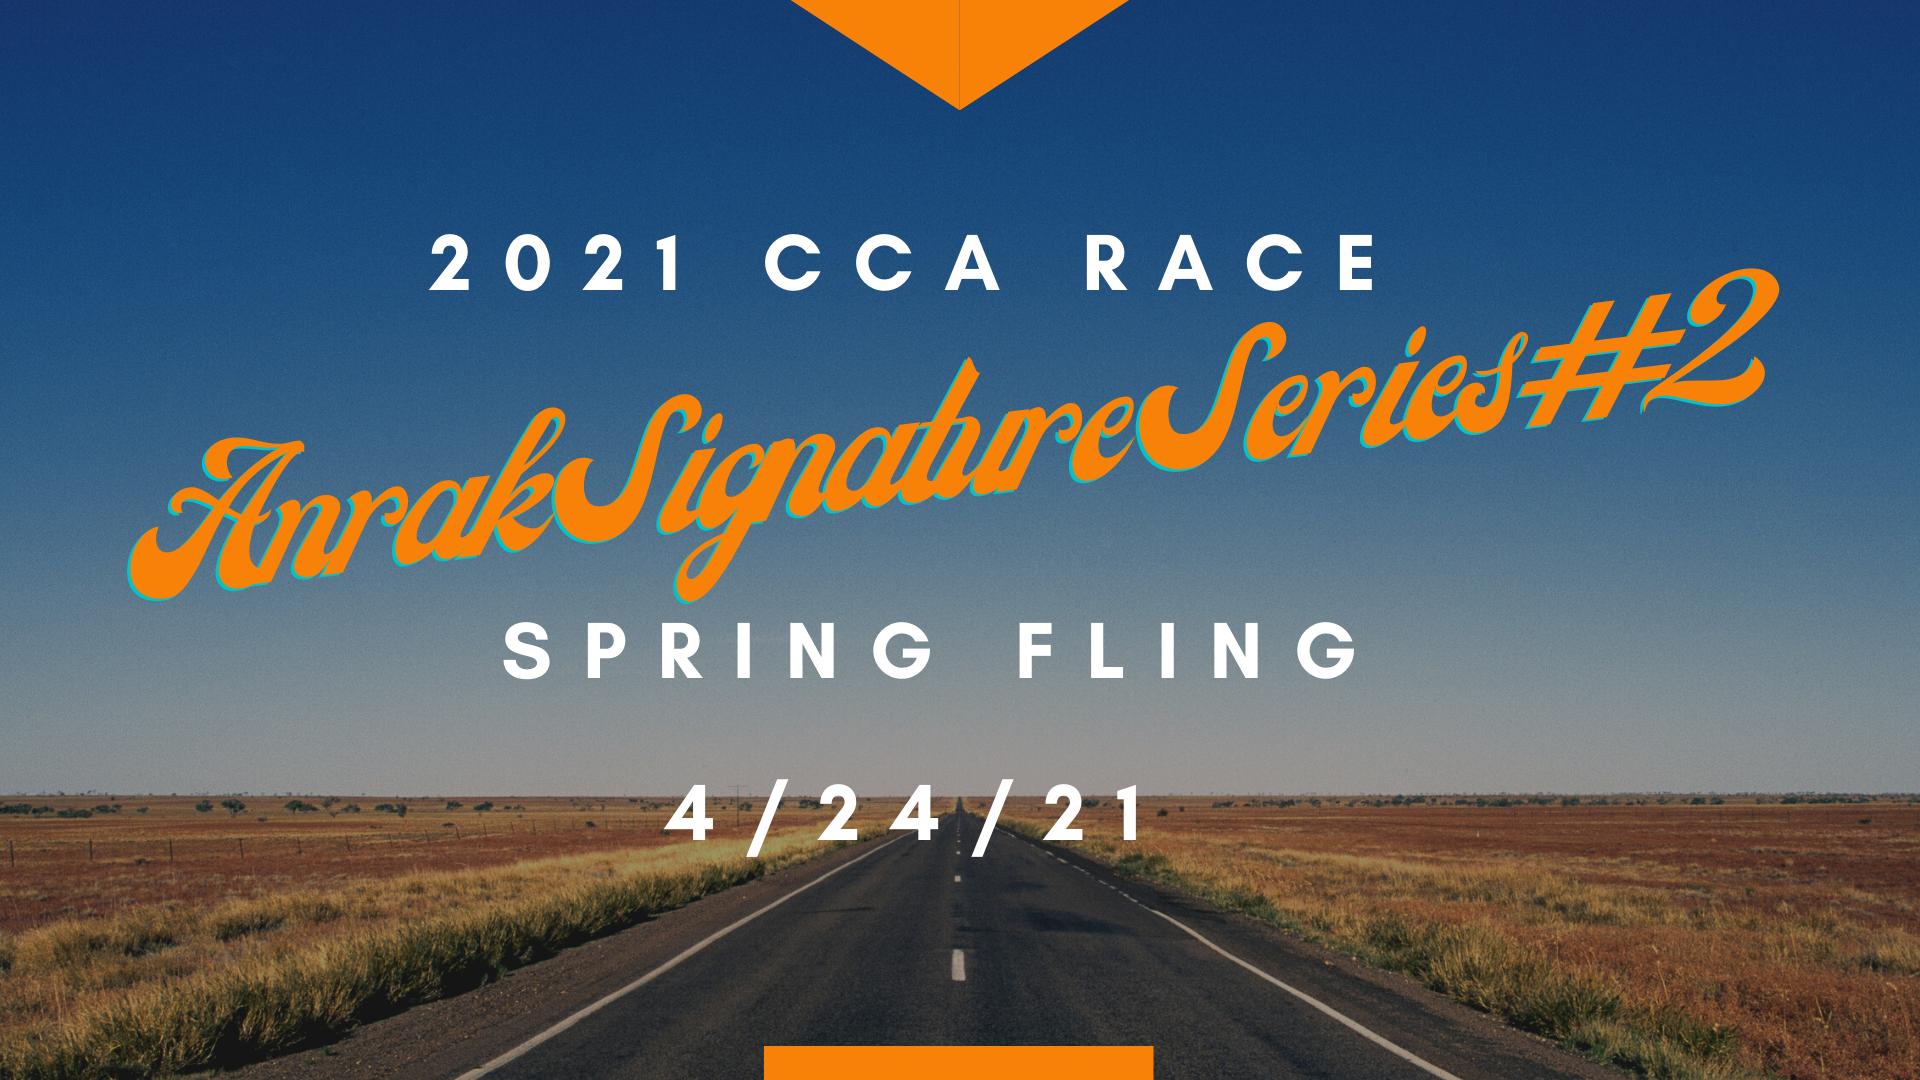 Signature Series CCA Race # 2 – Spring Fling